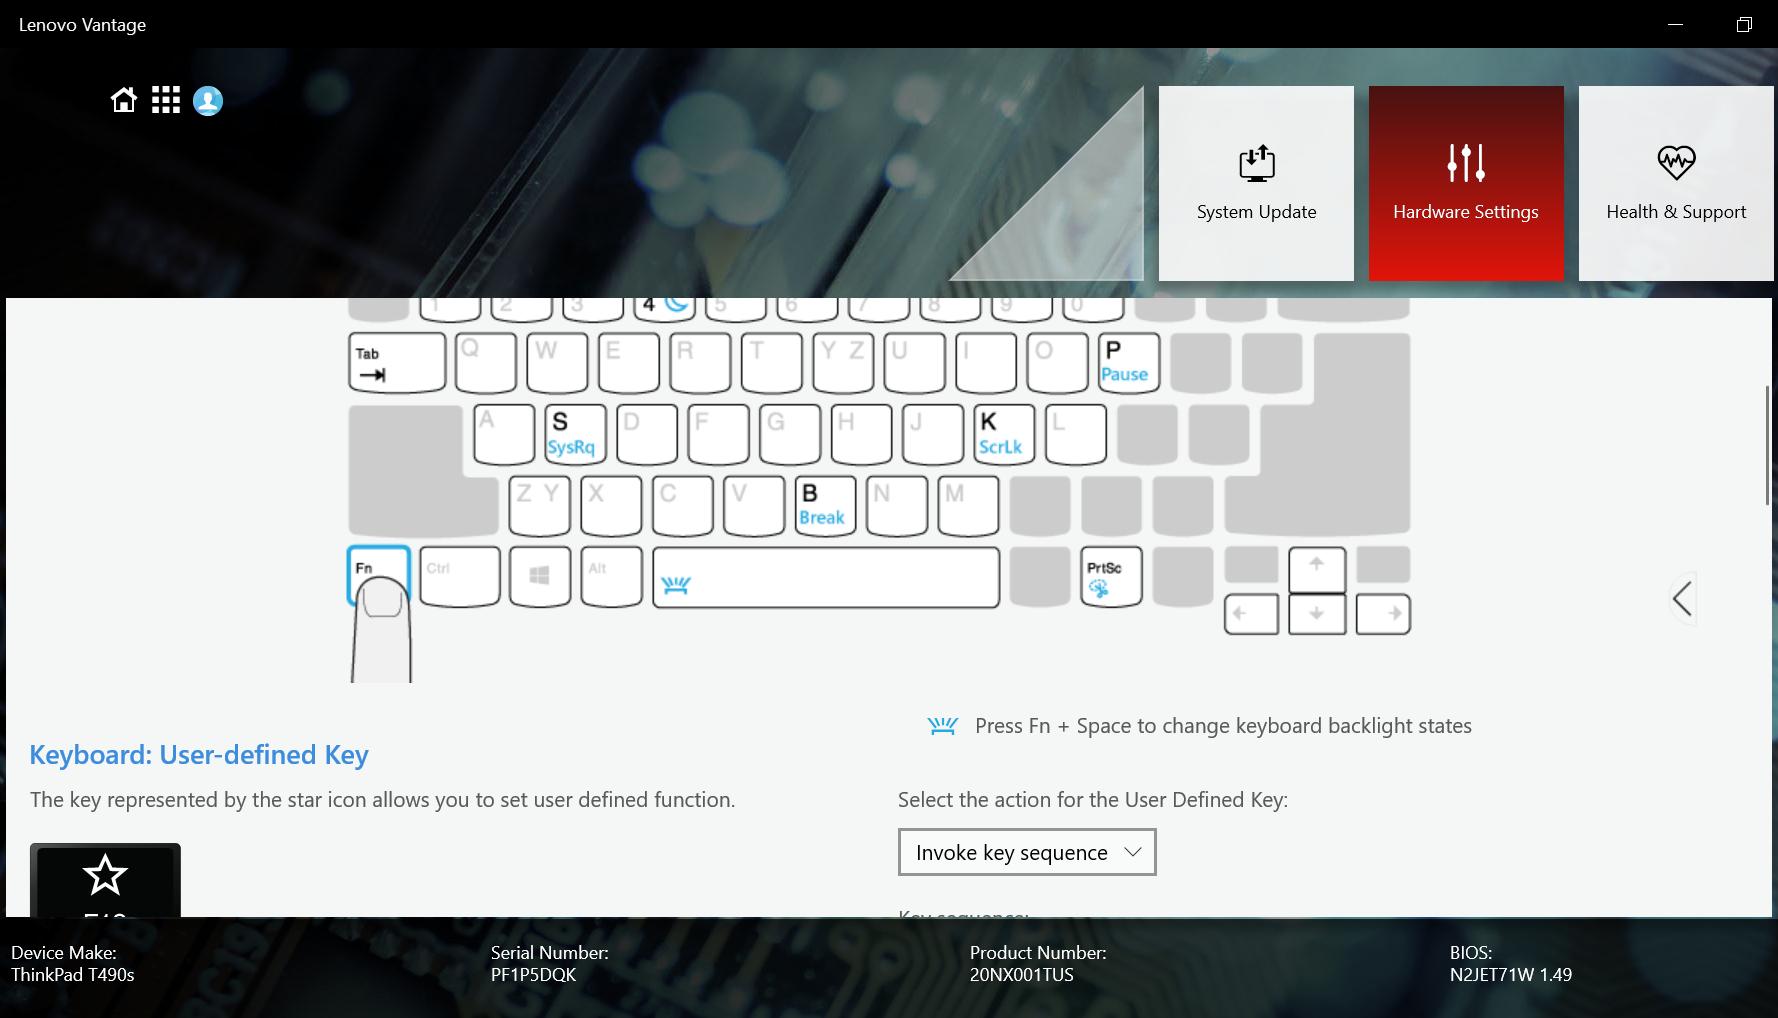 The keyboard settings menu in the Lenovo Vantage software.